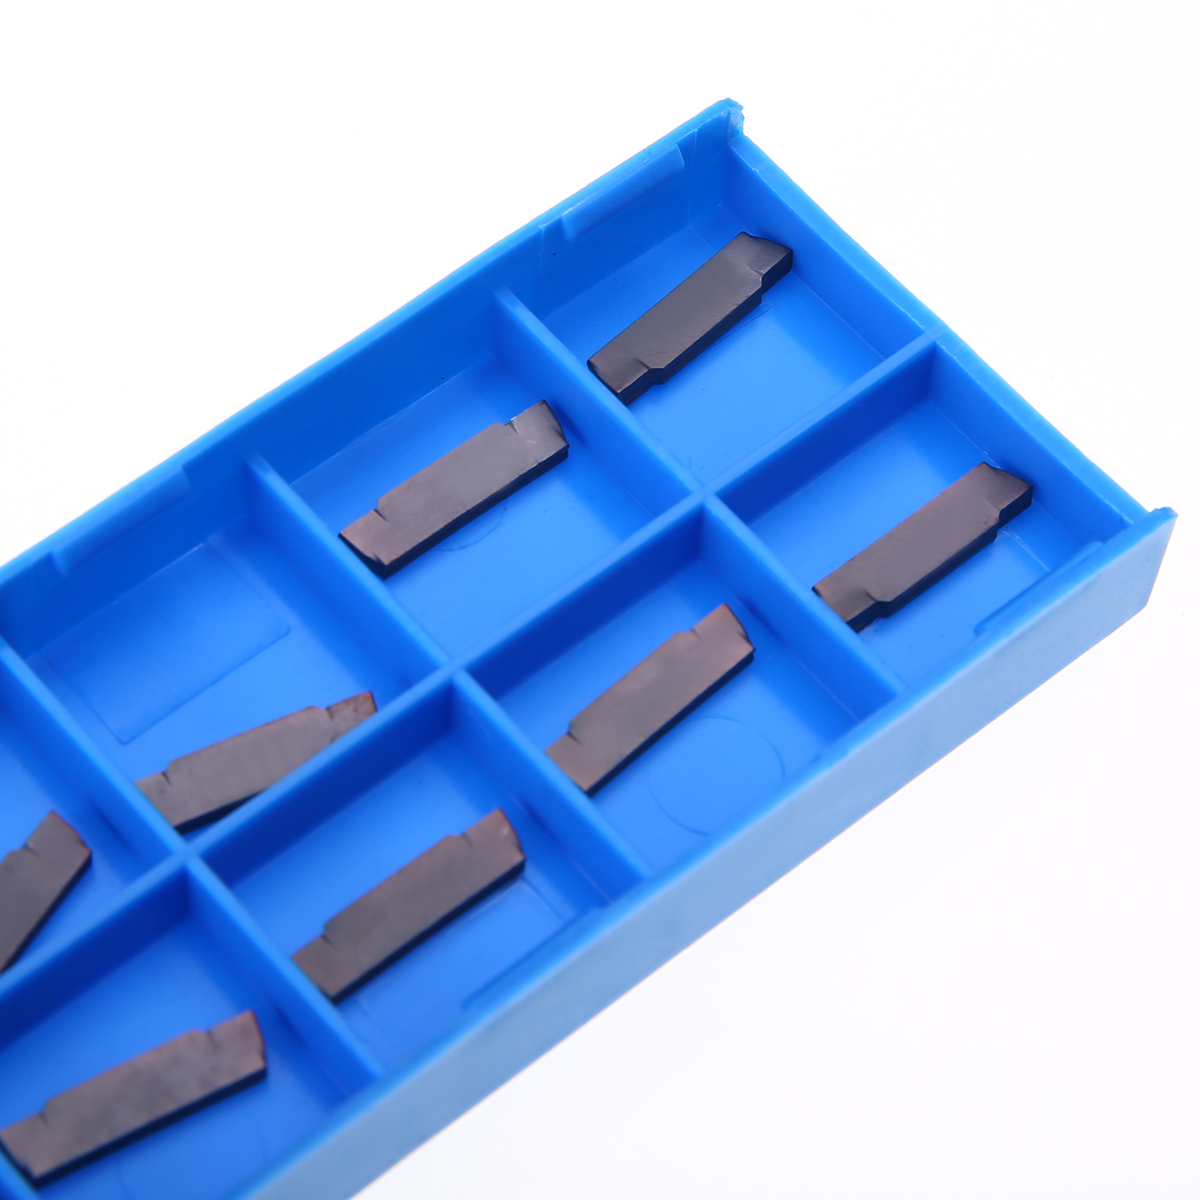 10pcs MGMN200-G LDA Carbide Inserts CNC Lathe Grooving Cutting Tool Insert Set with Box